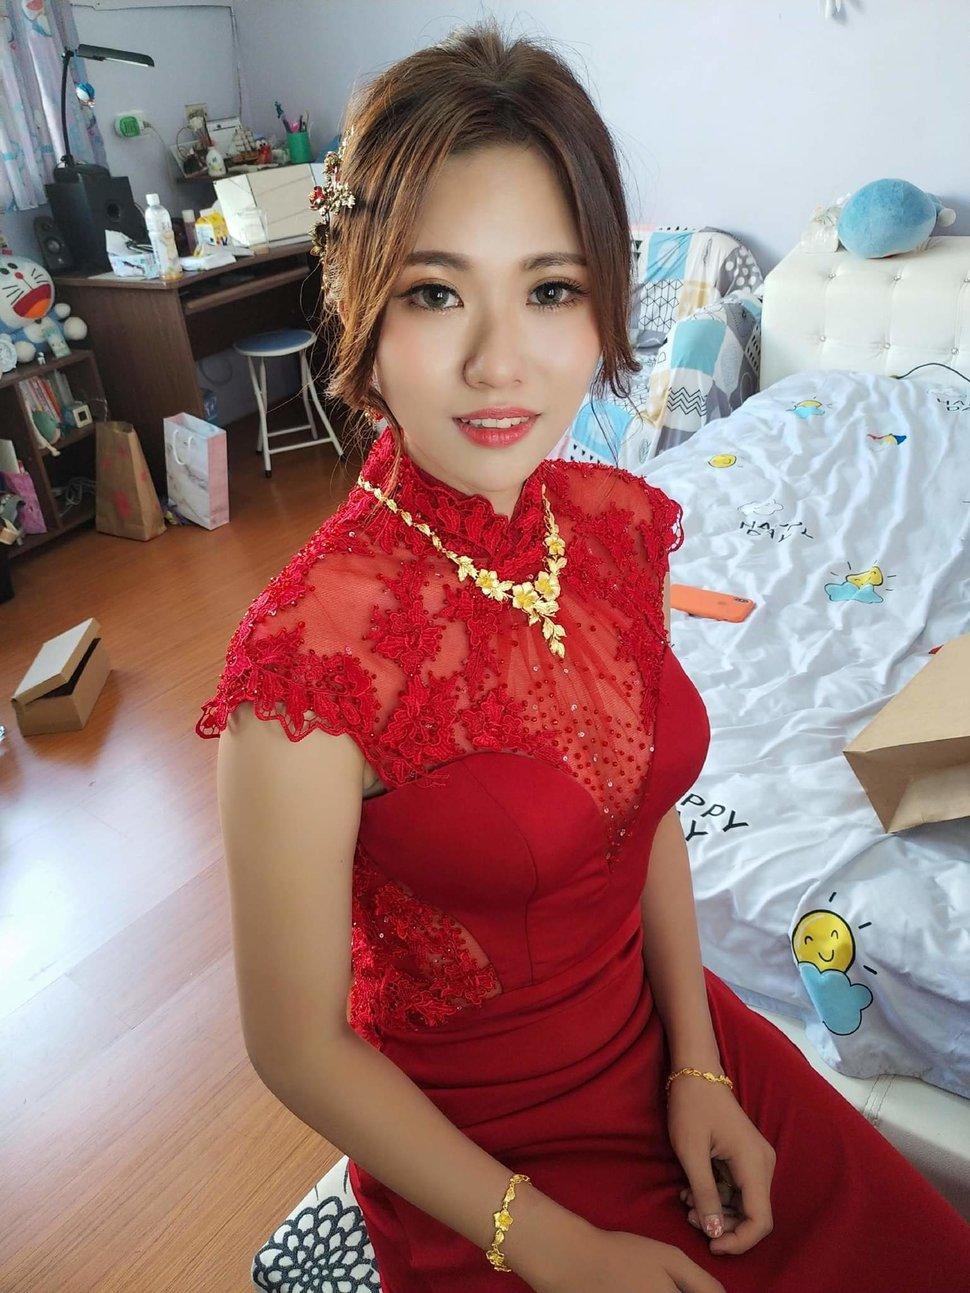 FB_IMG_1570879285951 - 苗栗新秘Livy/新竹新秘/台中新秘《結婚吧》